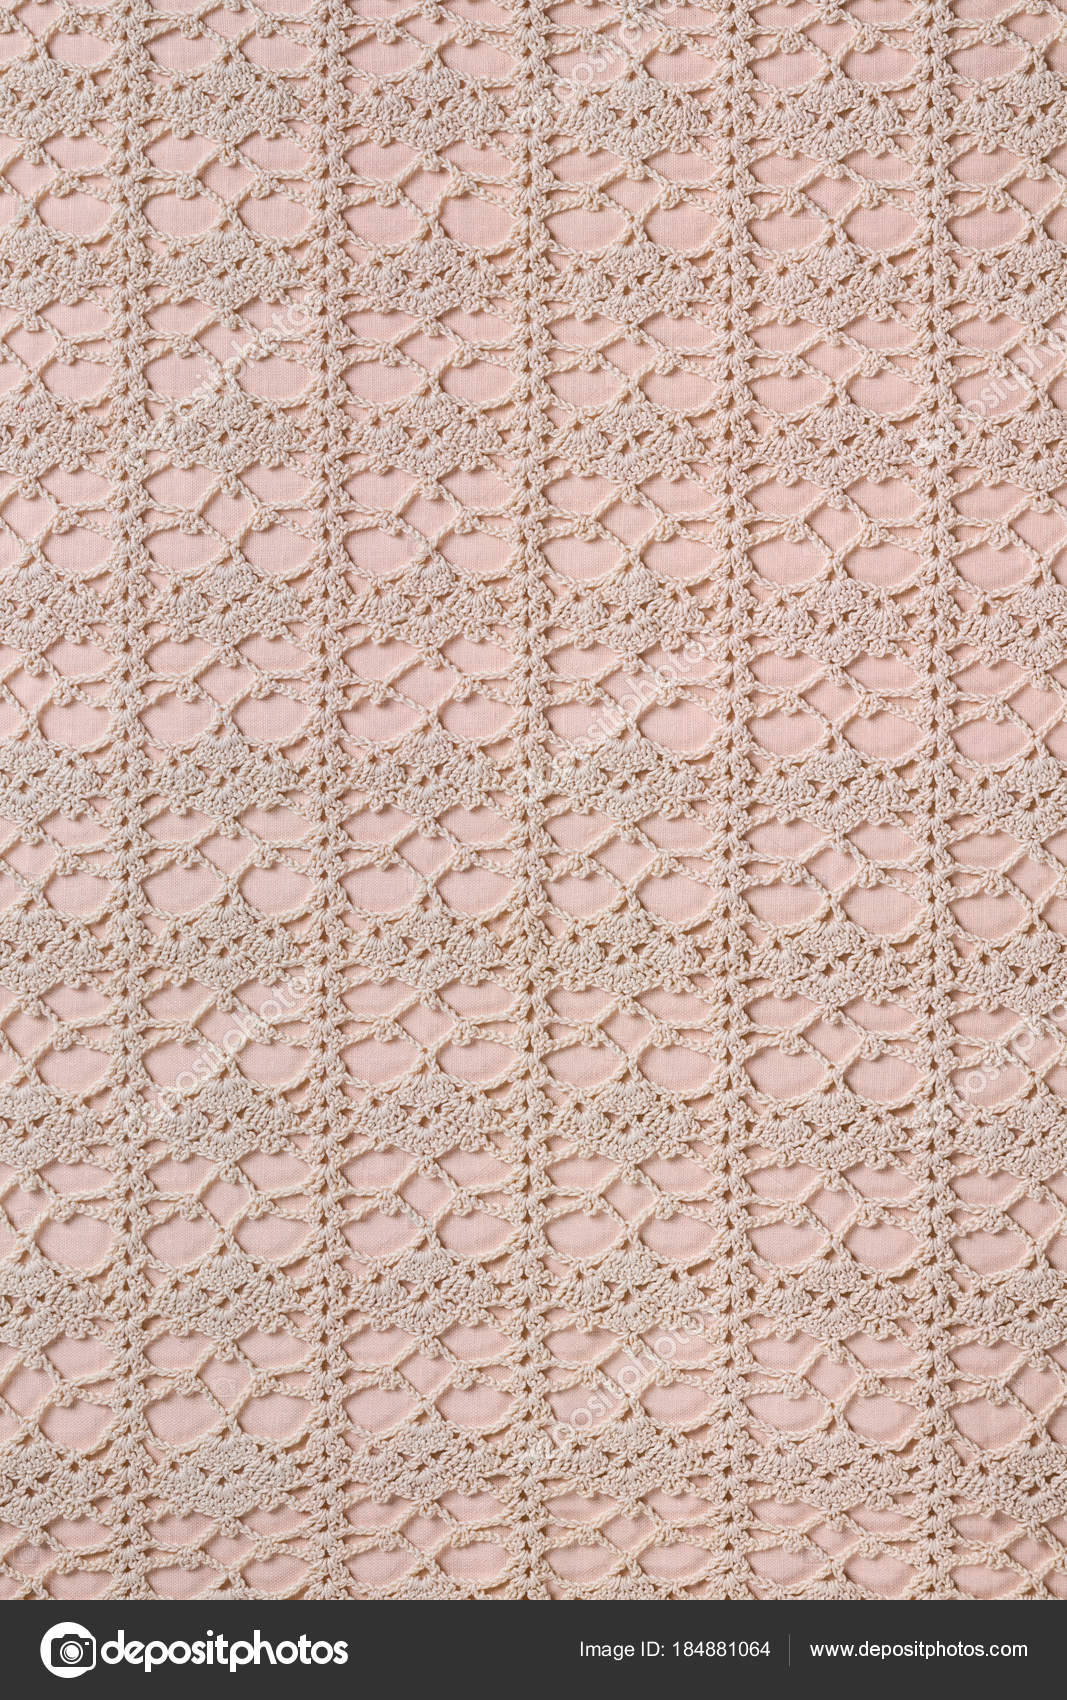 13b9dee3d24f Πανέμορφο Φόντο Λεπτή Vintage Πλεκτό Σπιτικό Λευκή Δαντέλα Βελονάκι  Χαρτοπετσέτες — Φωτογραφία Αρχείου